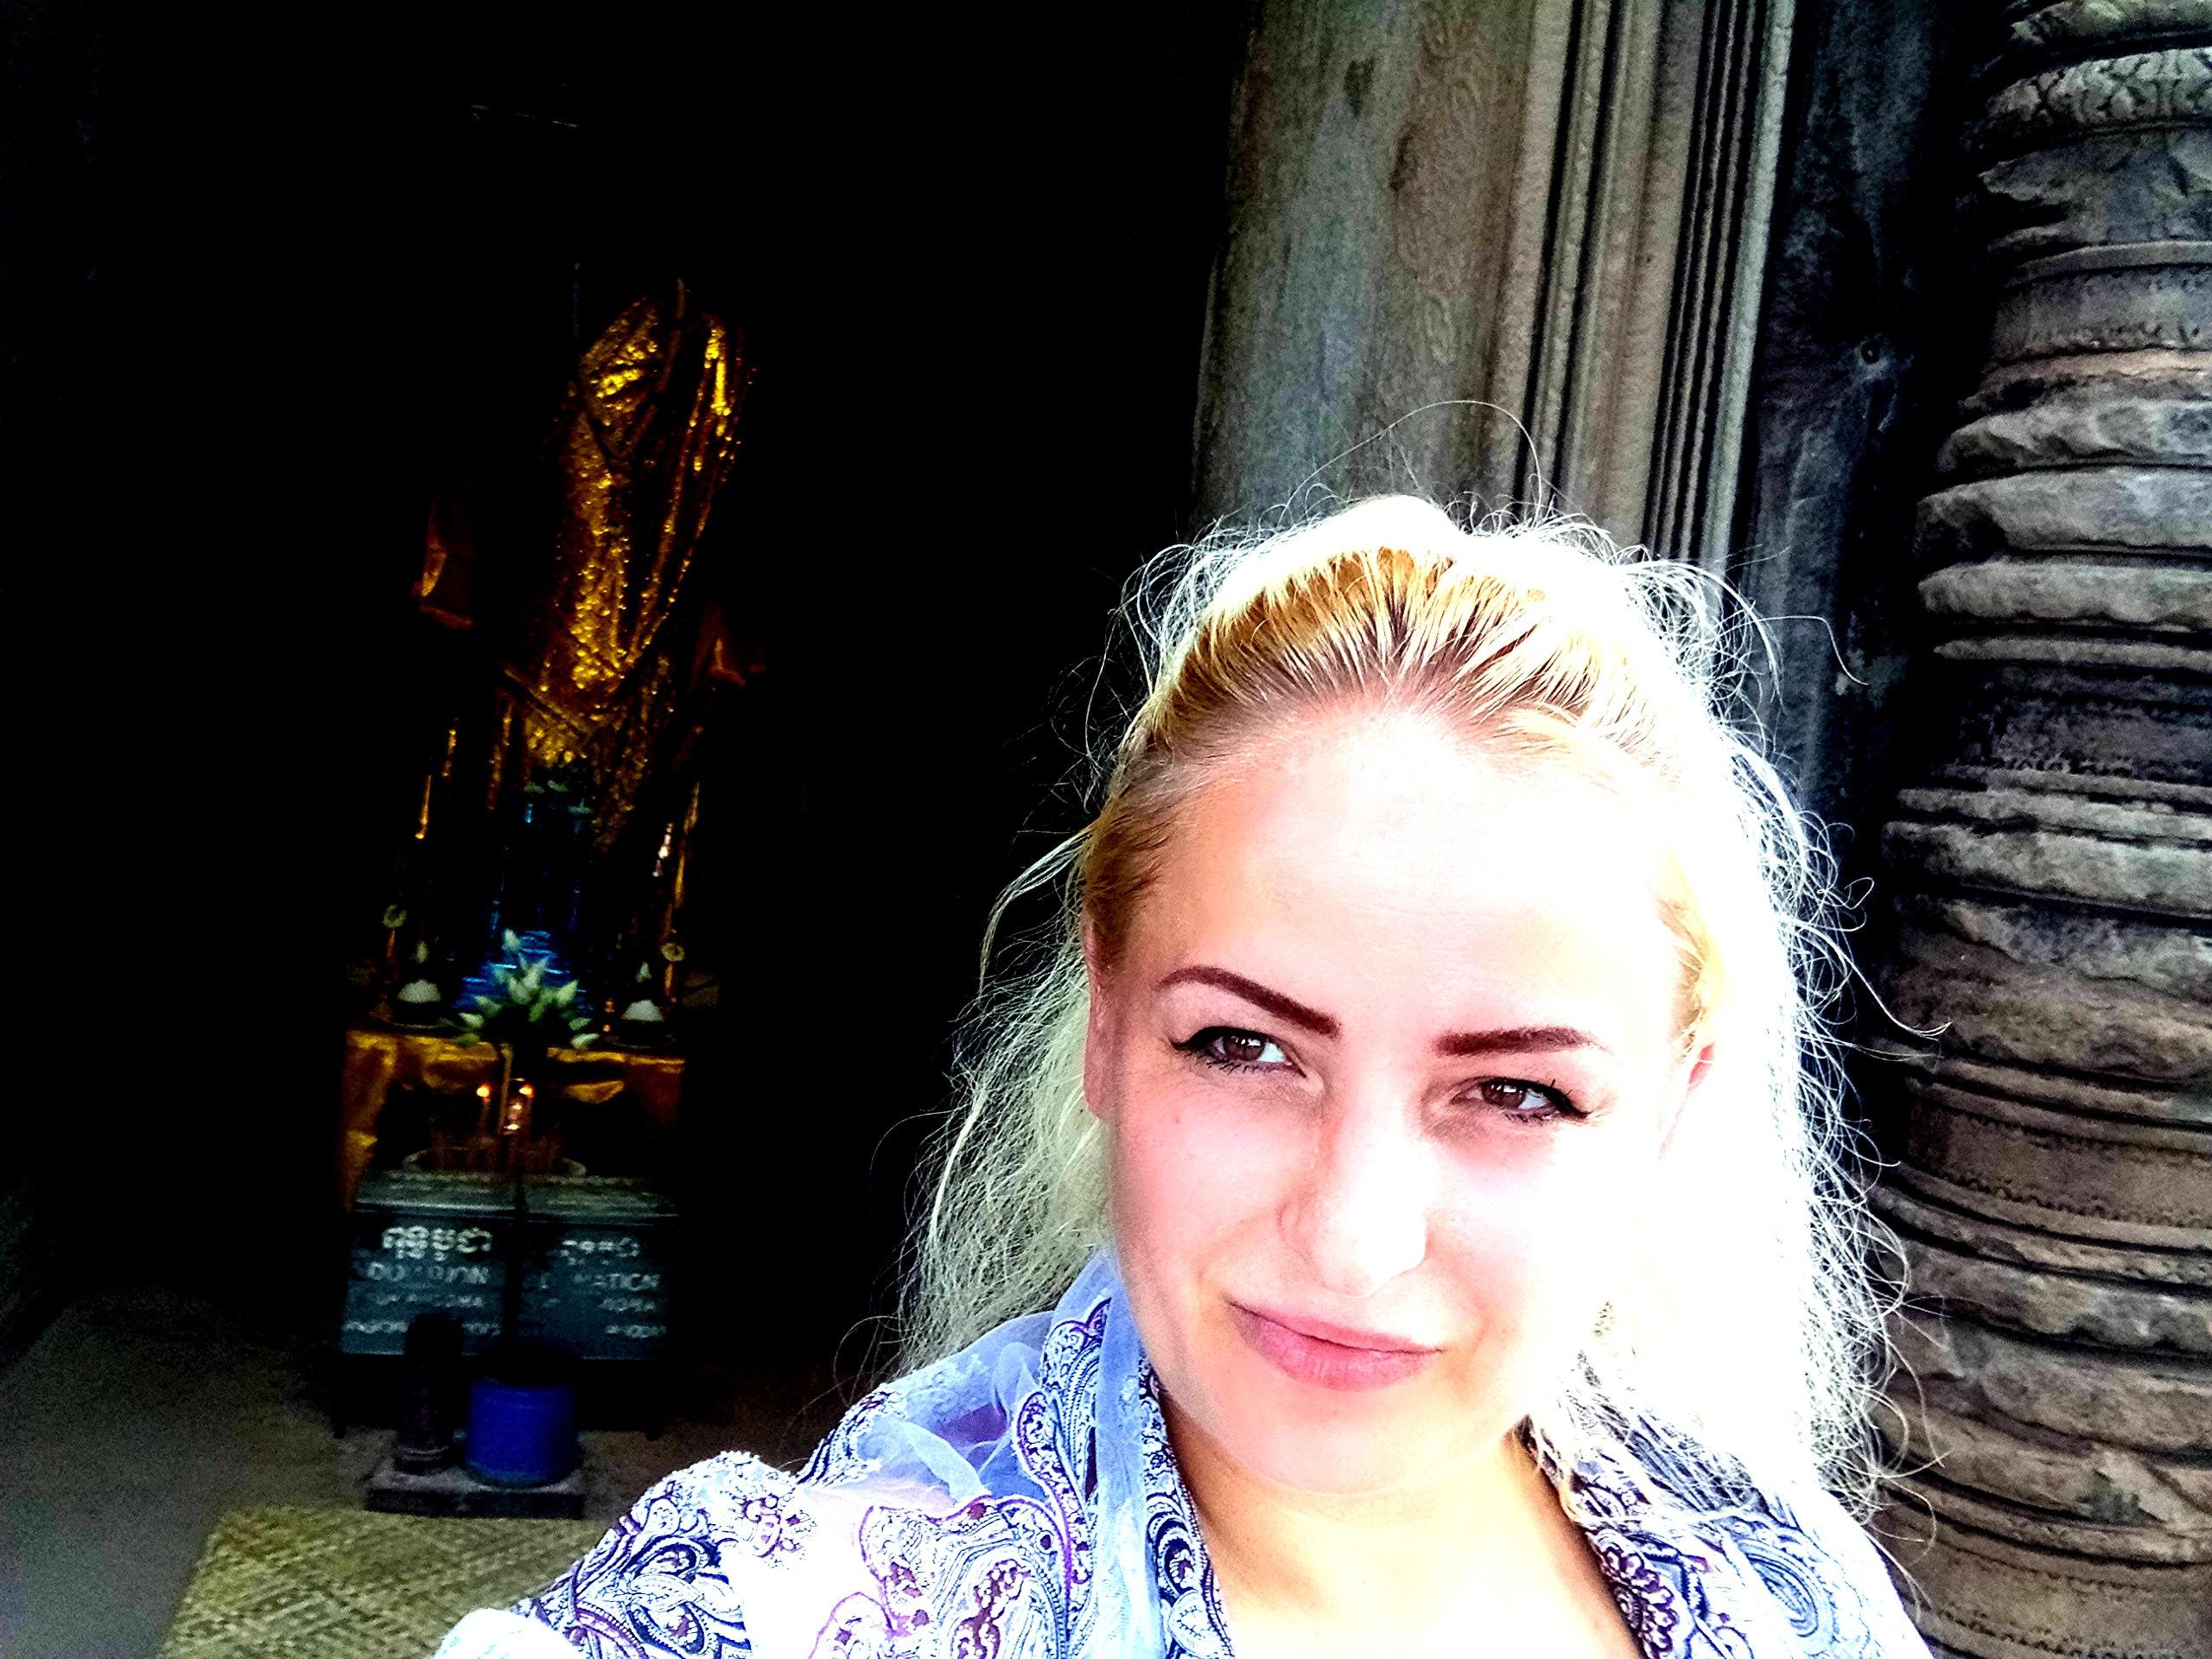 Елена Руденко (Валтея). Камбоджа. Ангкор. - Страница 4 QKl8remDKkY